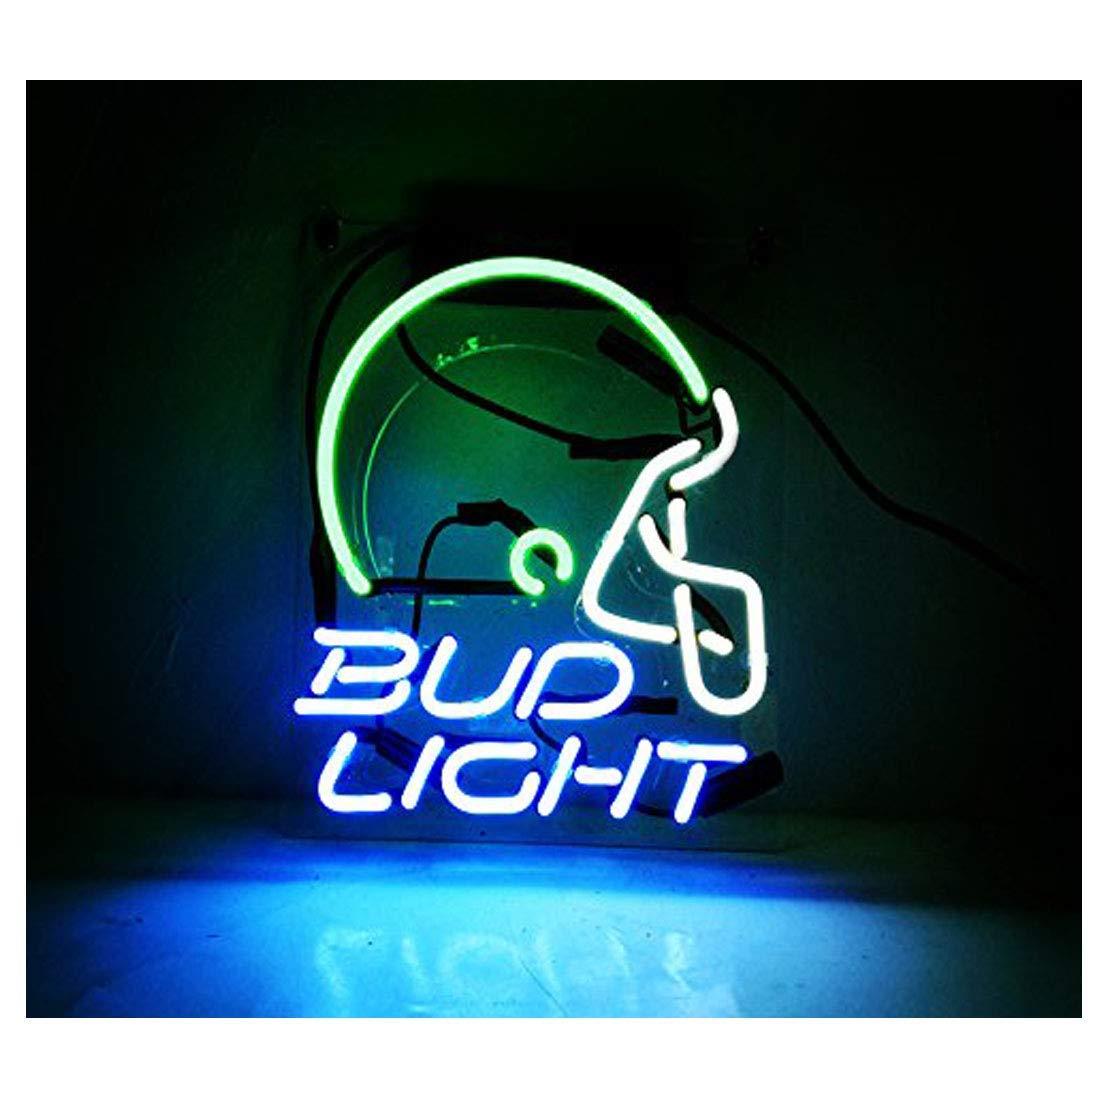 Budヘルメットライト装飾ネオンライトLEDネオンのレクリエーションゲームルームWindowsライトガレージ壁Signs 10